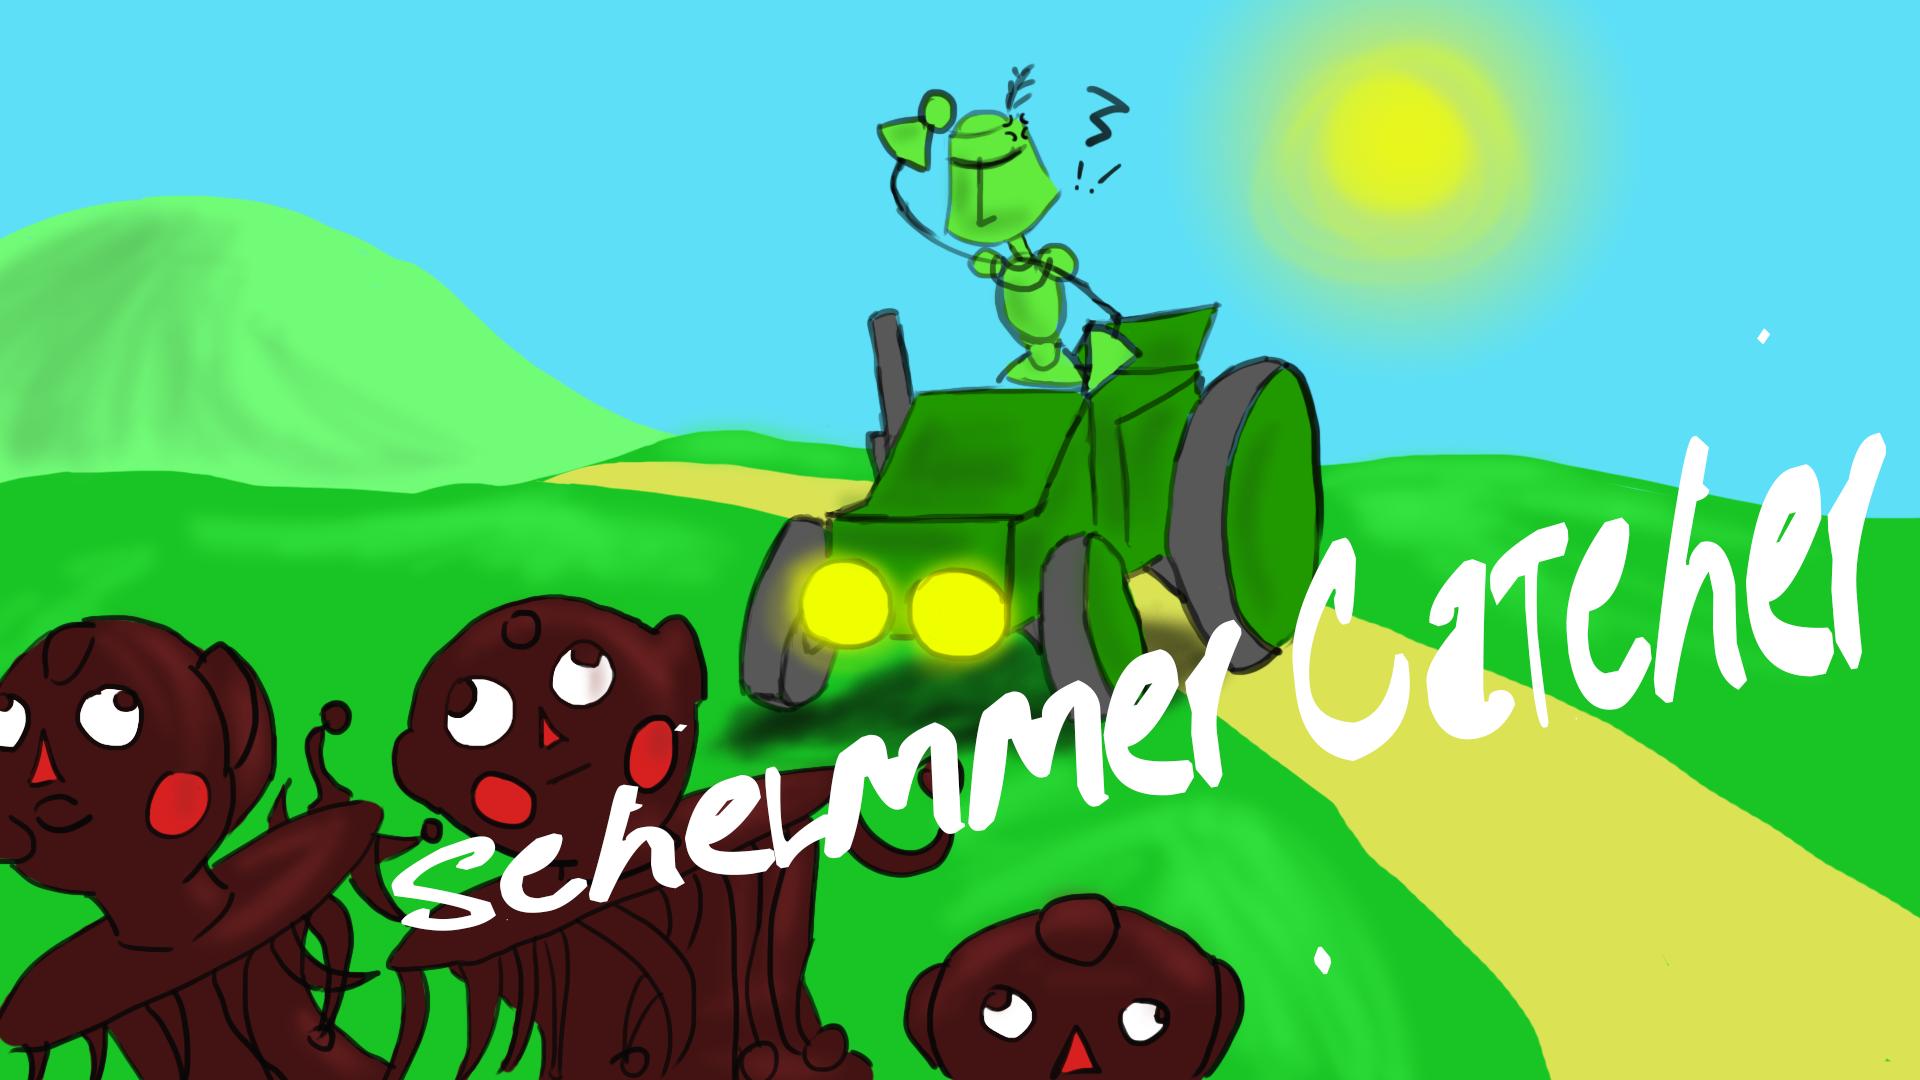 Schlemmer Catcher